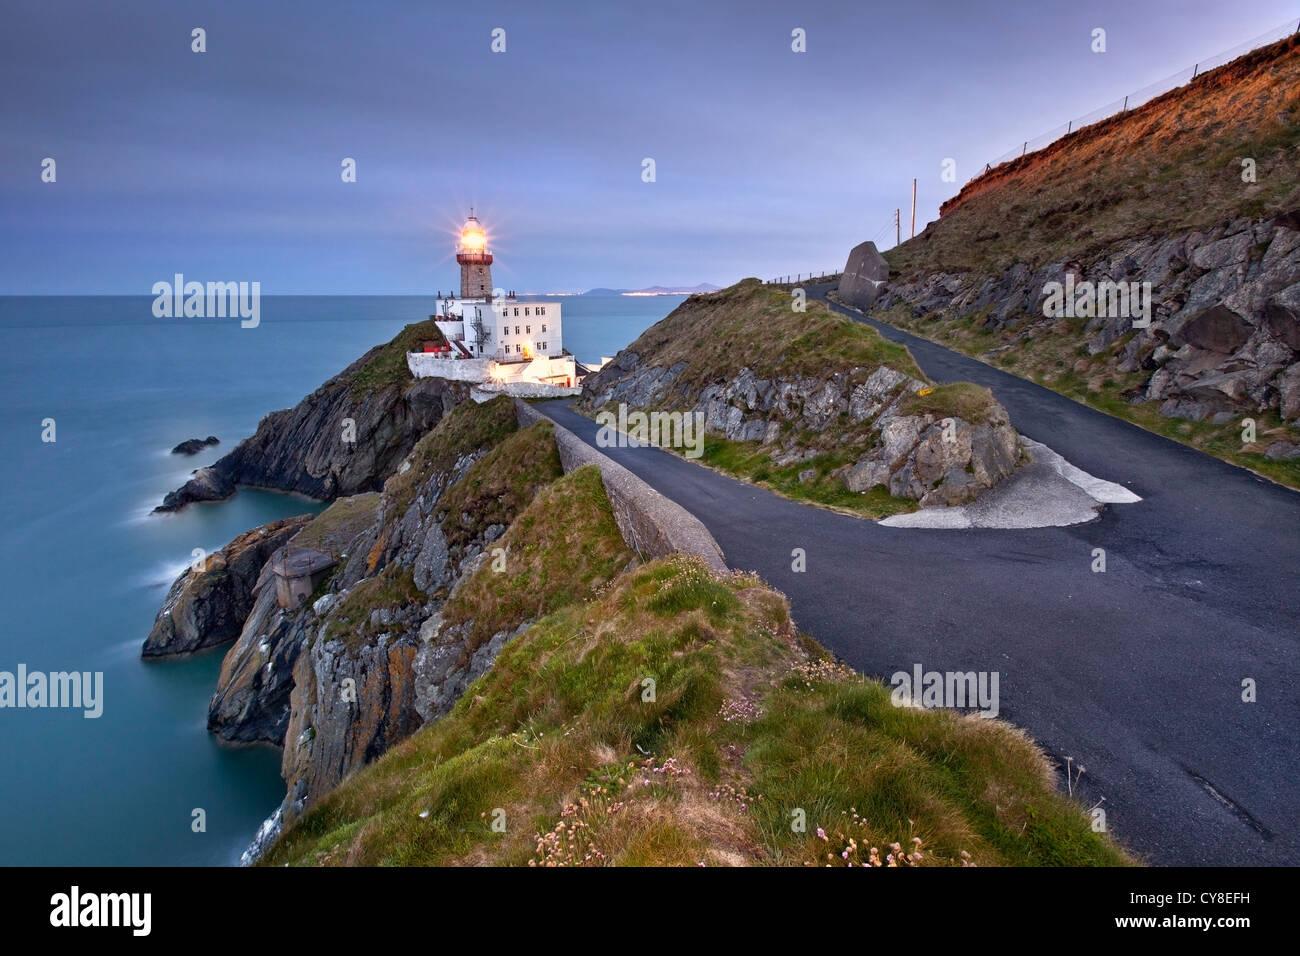 Baily Lighthouse captured at Dusk. - Stock Image